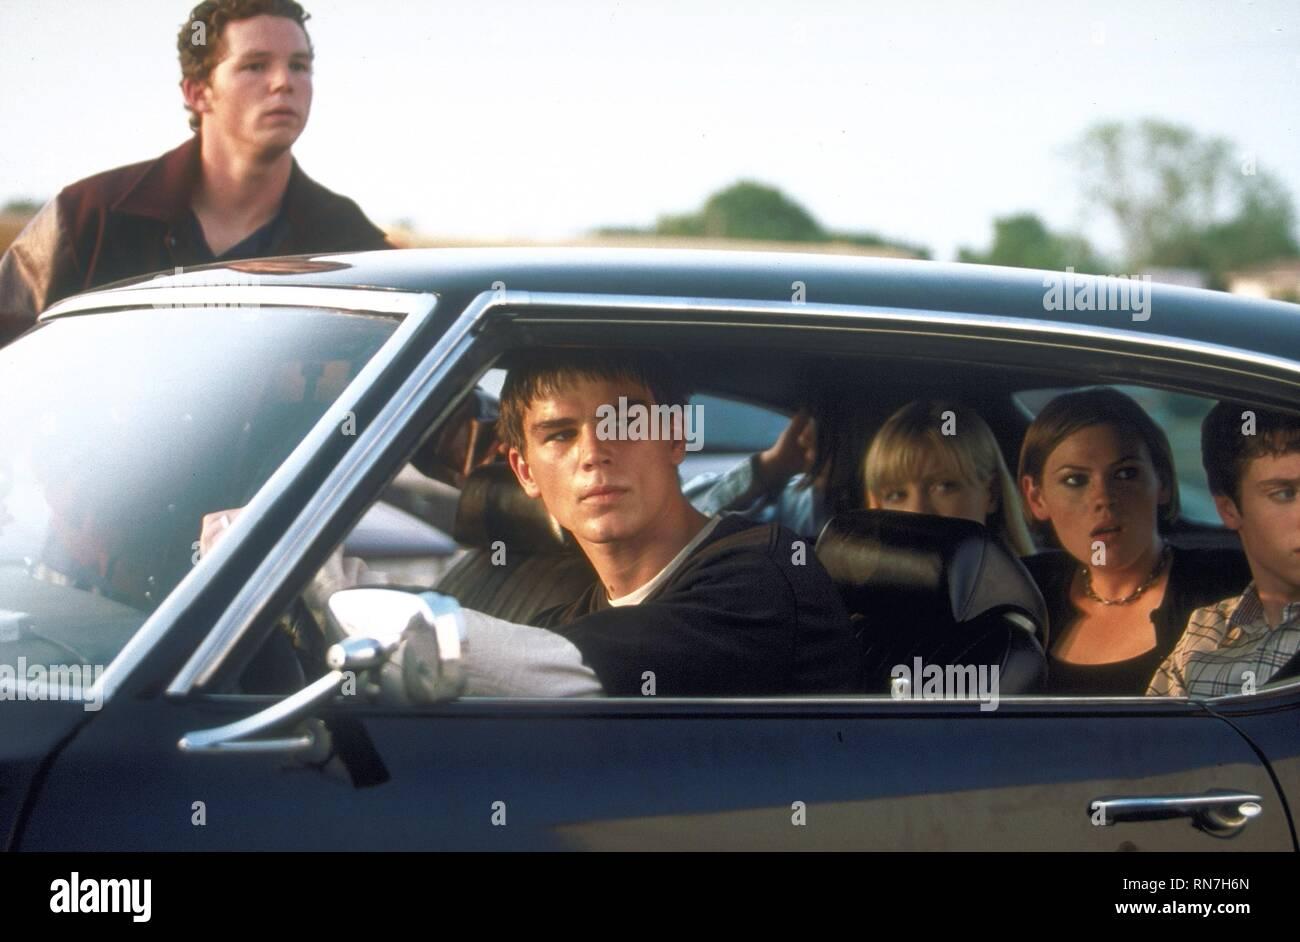 SHAWN HATOSY, JOSH HARTNETT, LAURA HARRIS, CLEA DUVALL,ELIJAH WOOD, THE FACULTY, 1998 - Stock Image